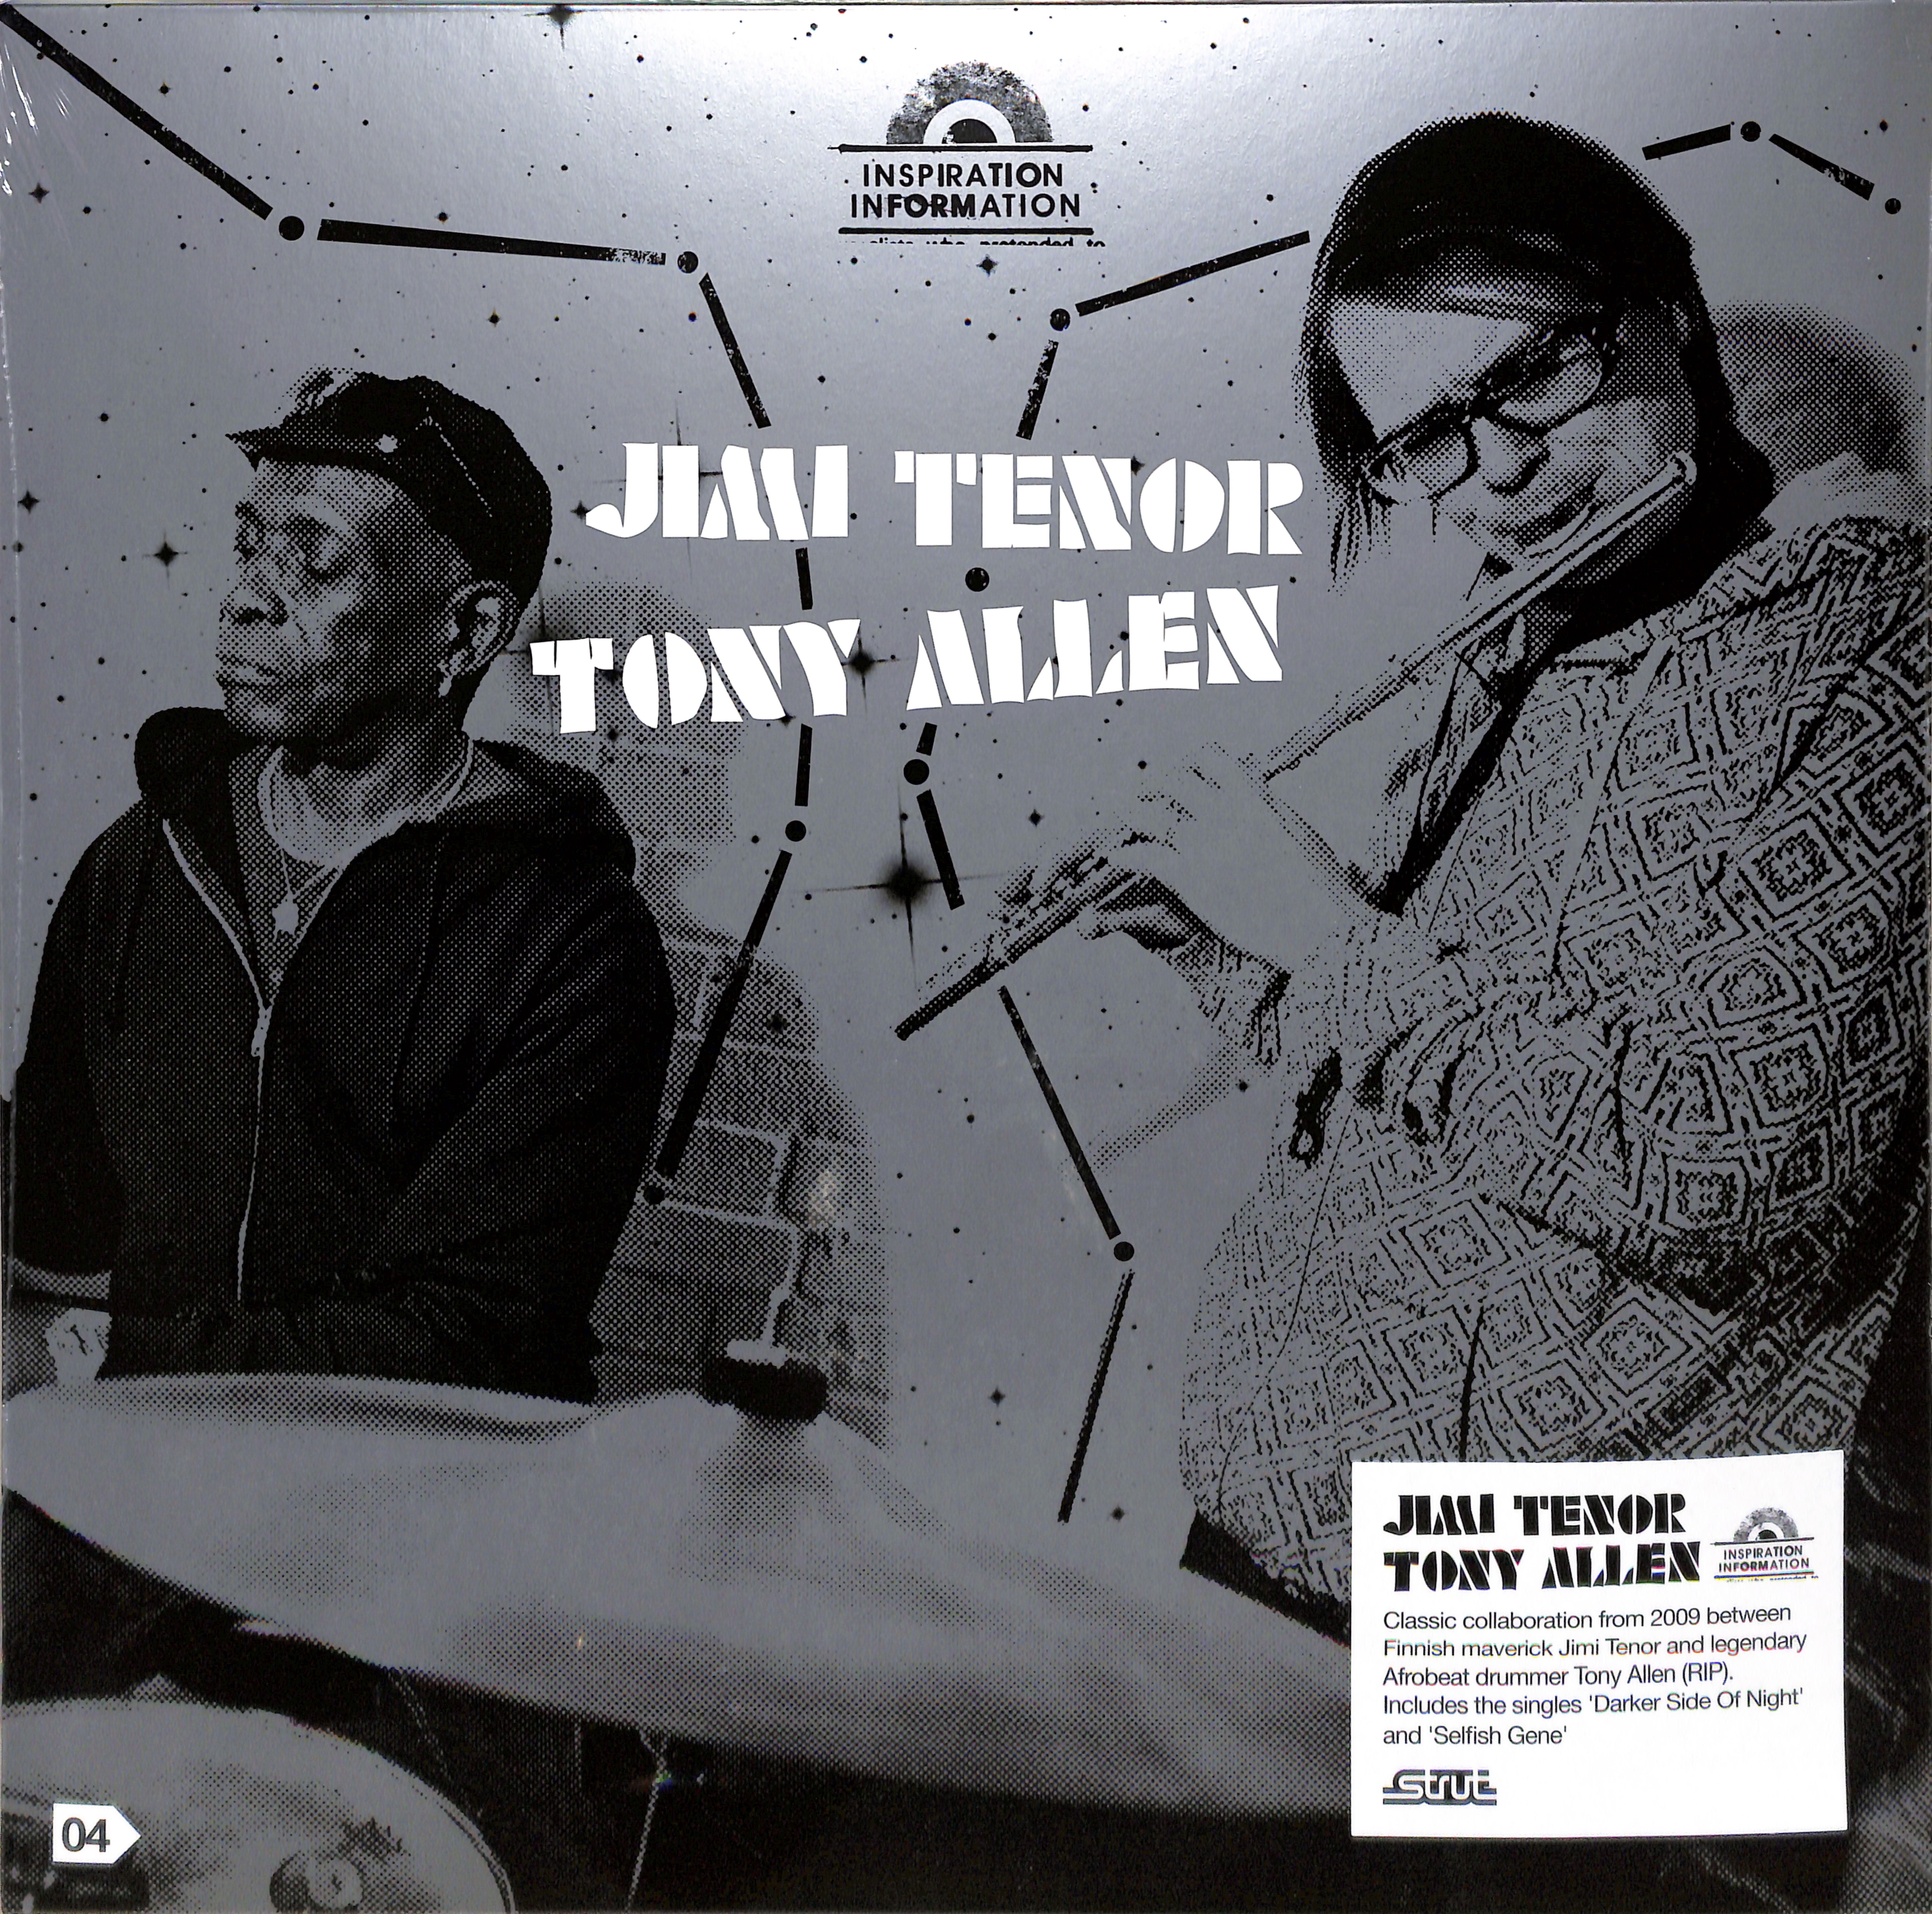 Jimi Tenor & Tony Allen - INSPIRATION INFORMATION 4